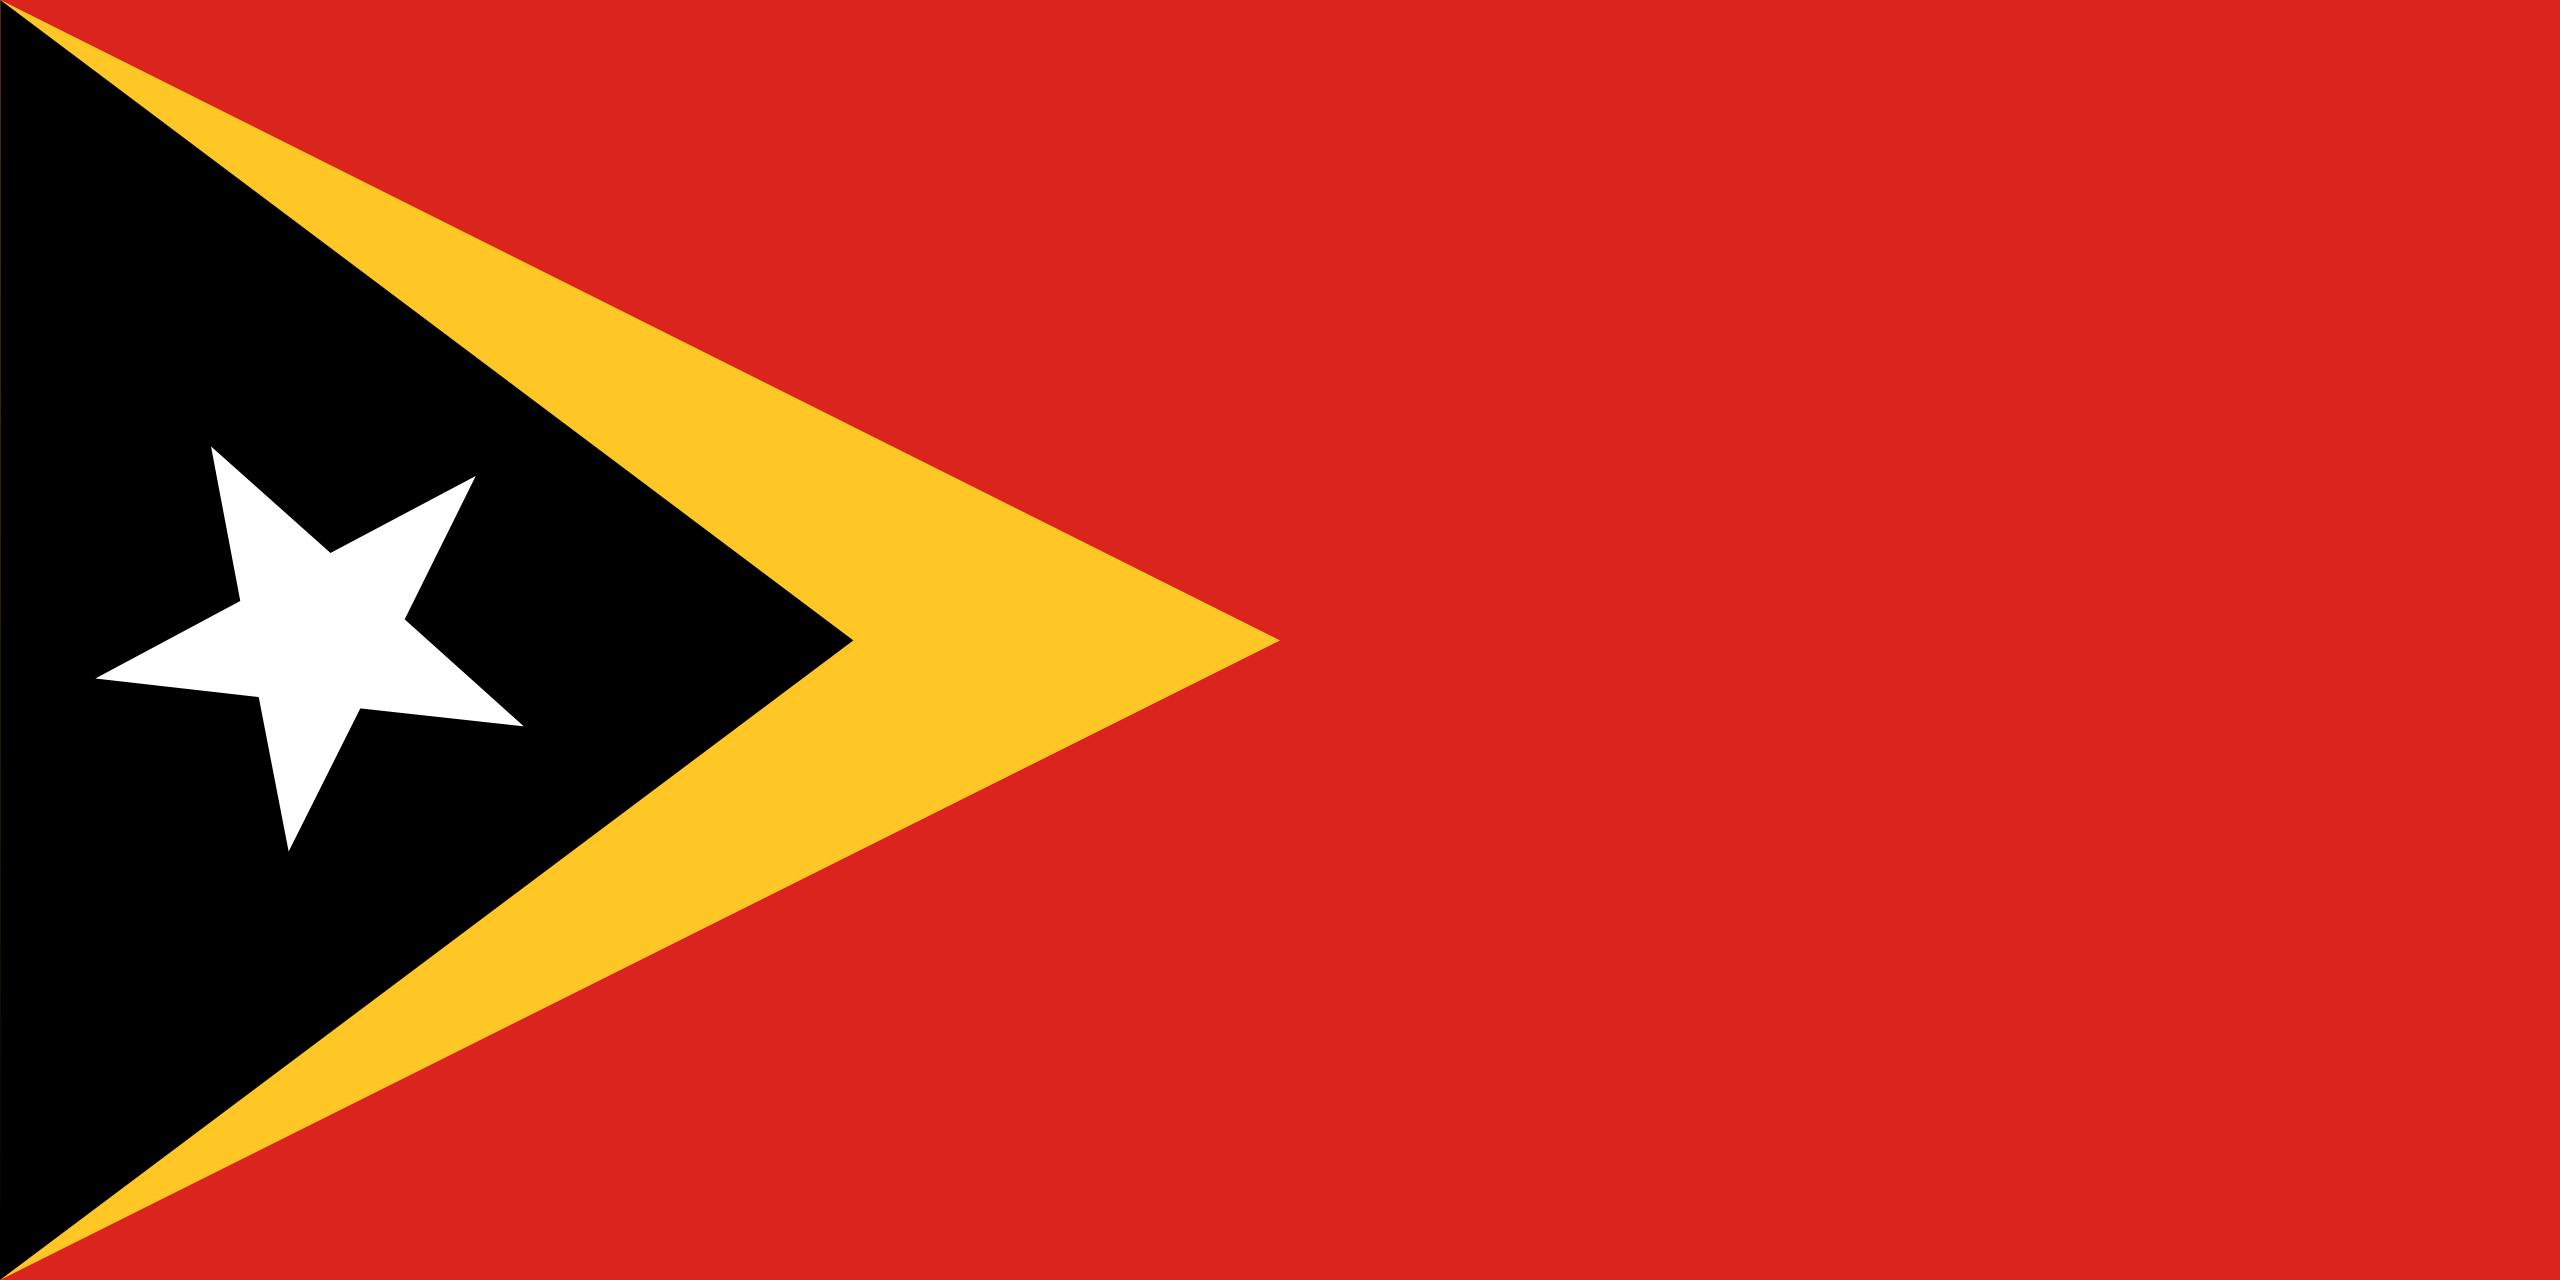 timor oriental, paese, emblema, logo, simbolo - Sfondi HD - Professor-falken.com